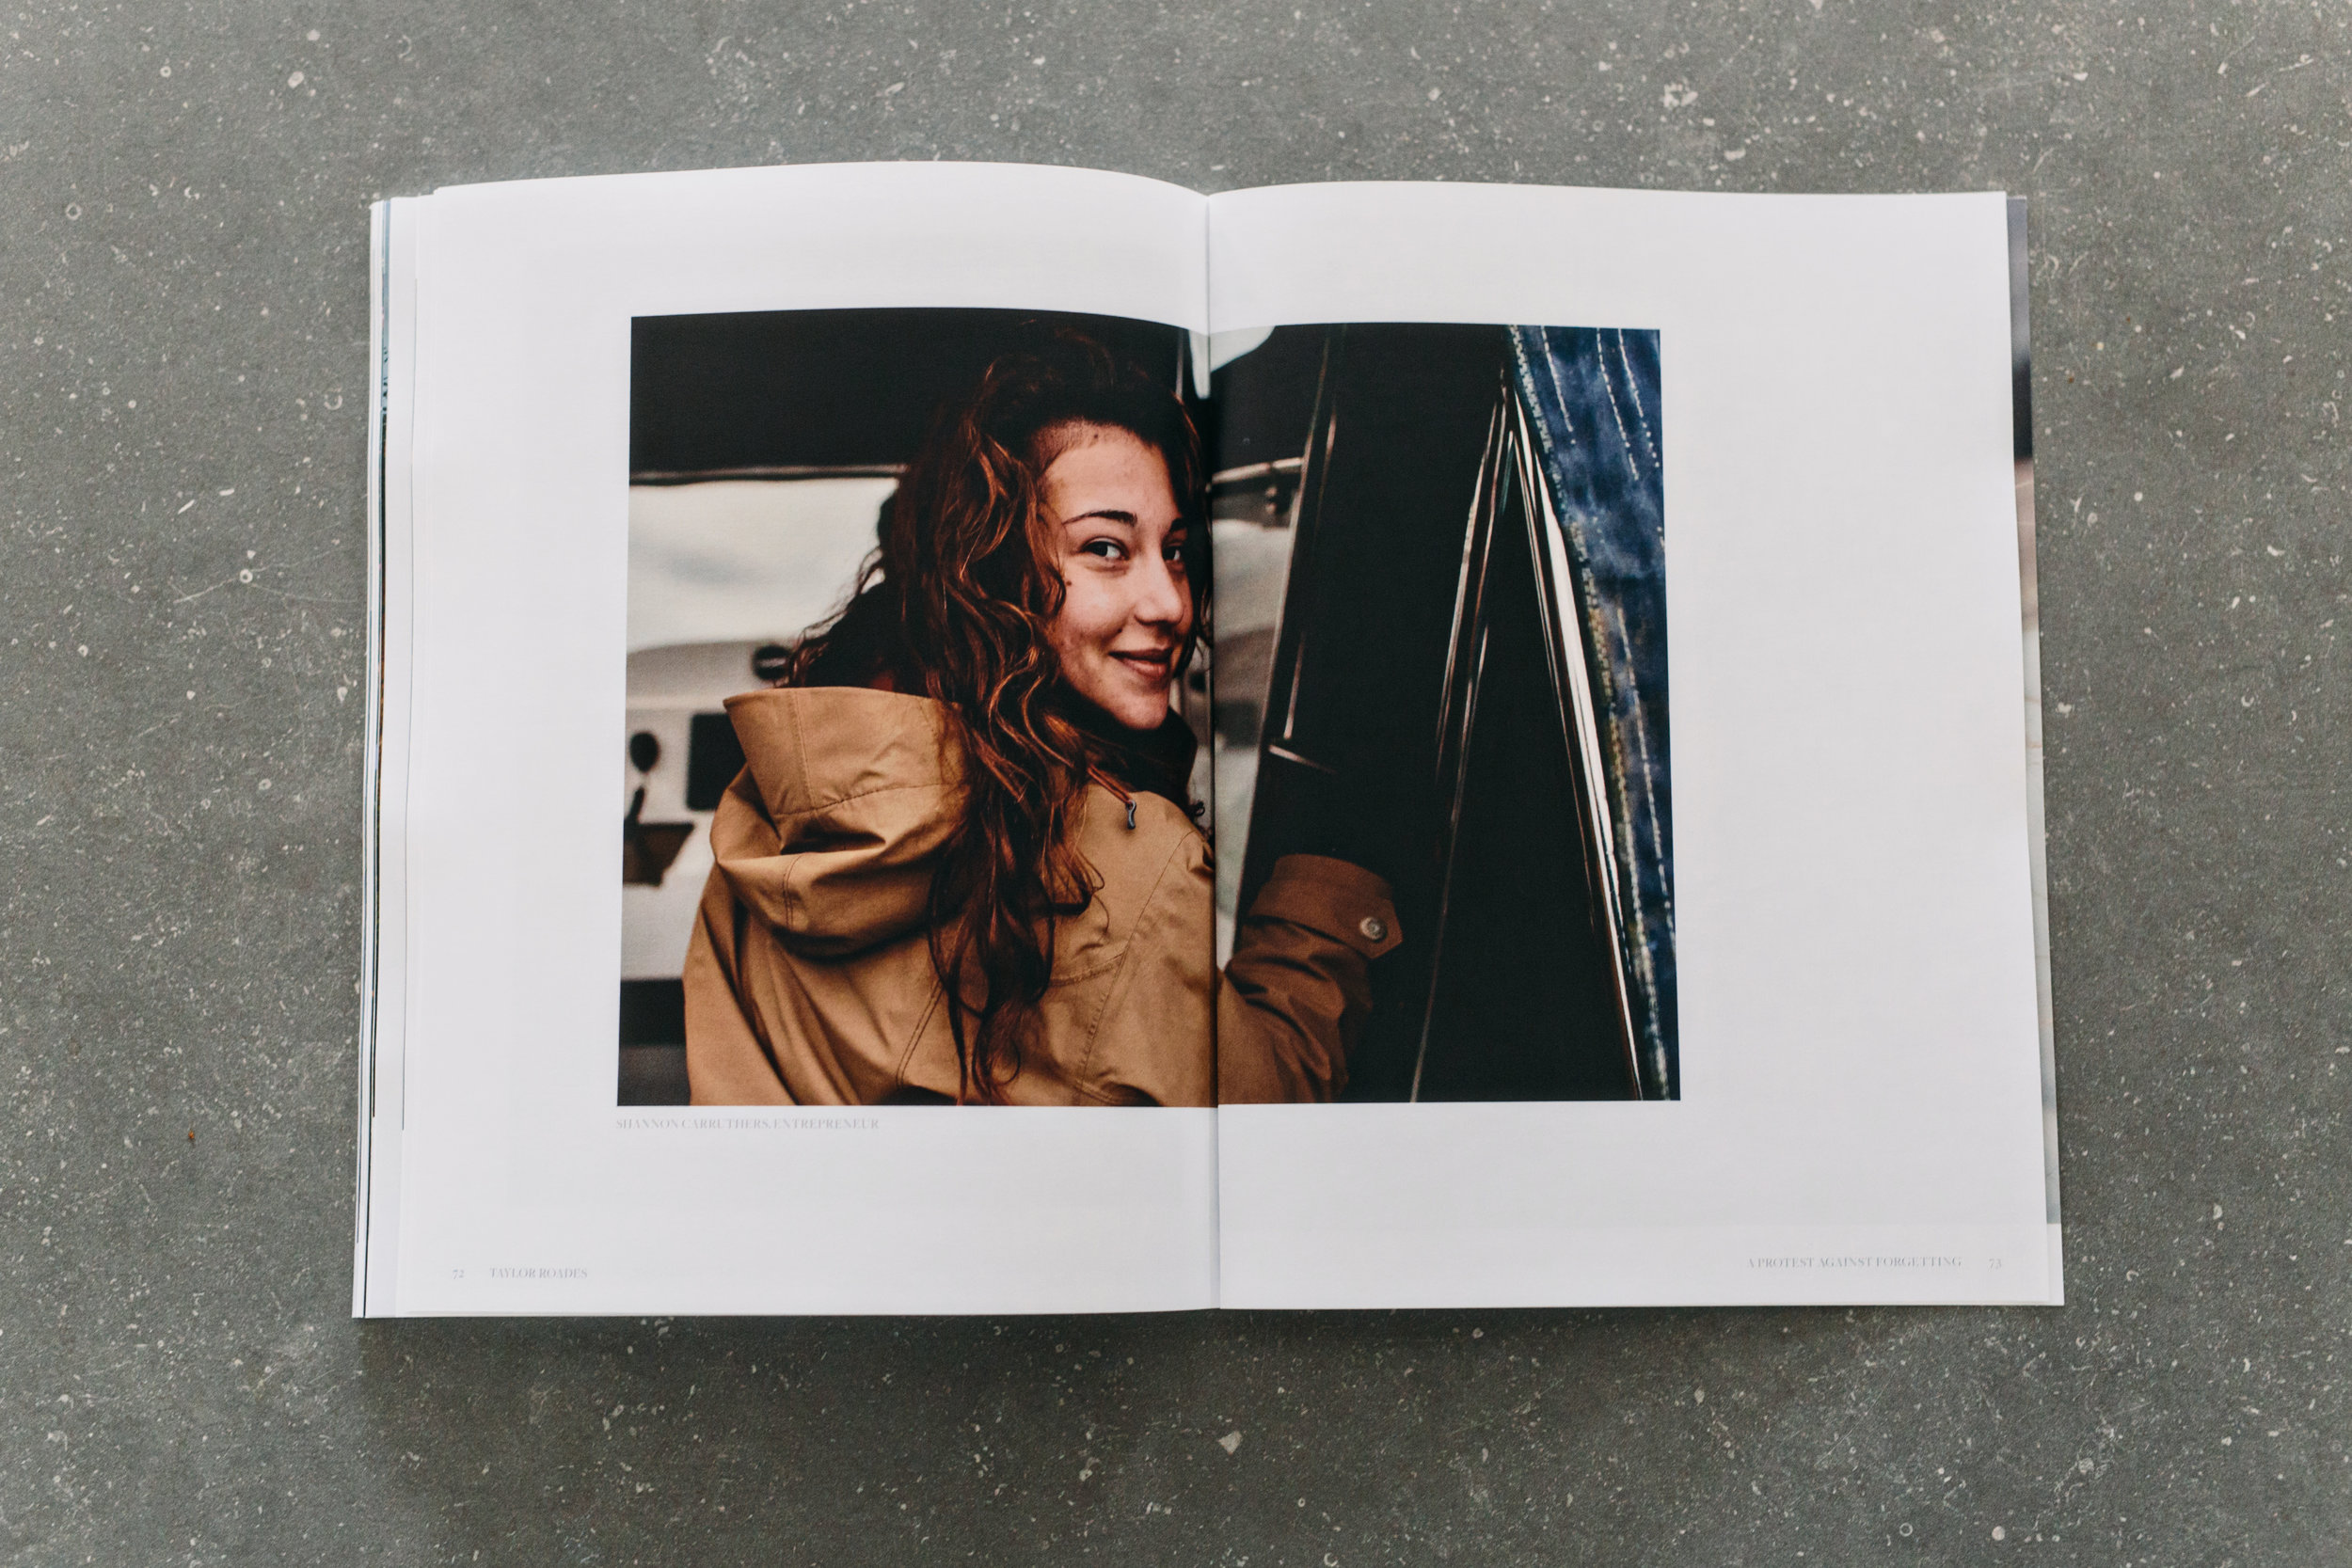 Promo-Books-Photos-TaylorRoades-0039.JPG